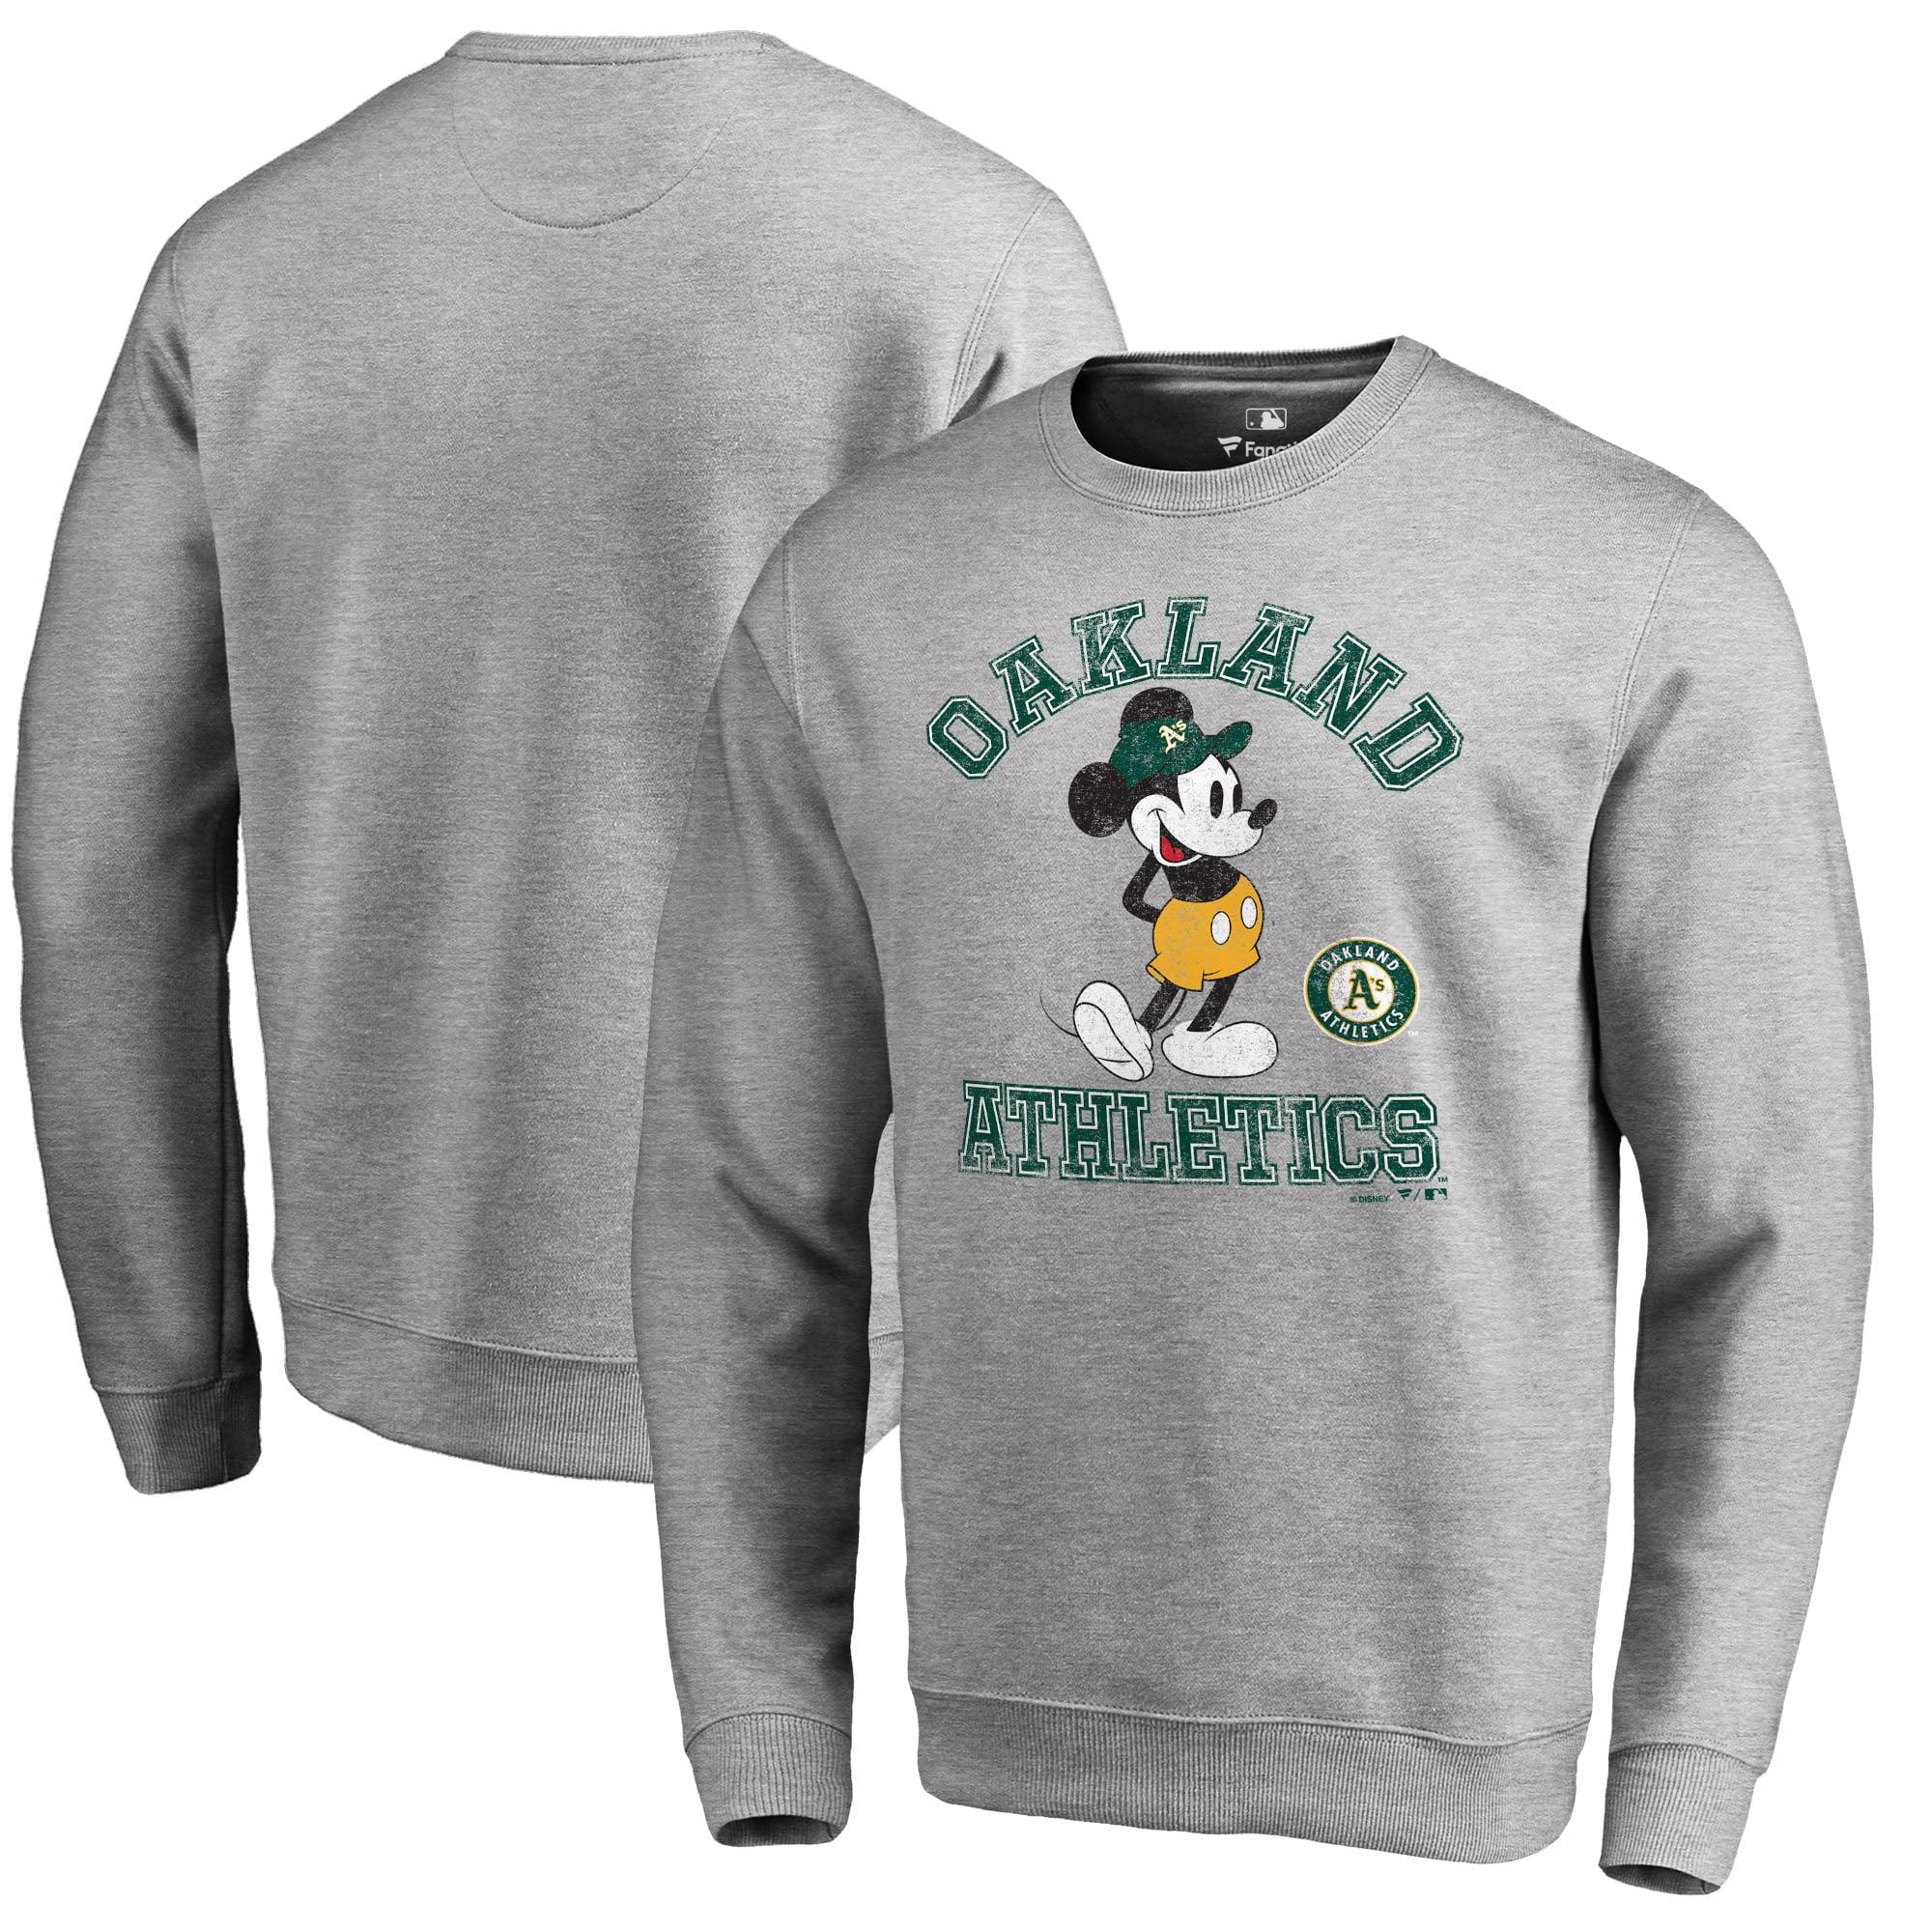 Oakland Athletics Fanatics Branded Disney MLB Tradition Pullover Sweatshirt - Heathered Gray